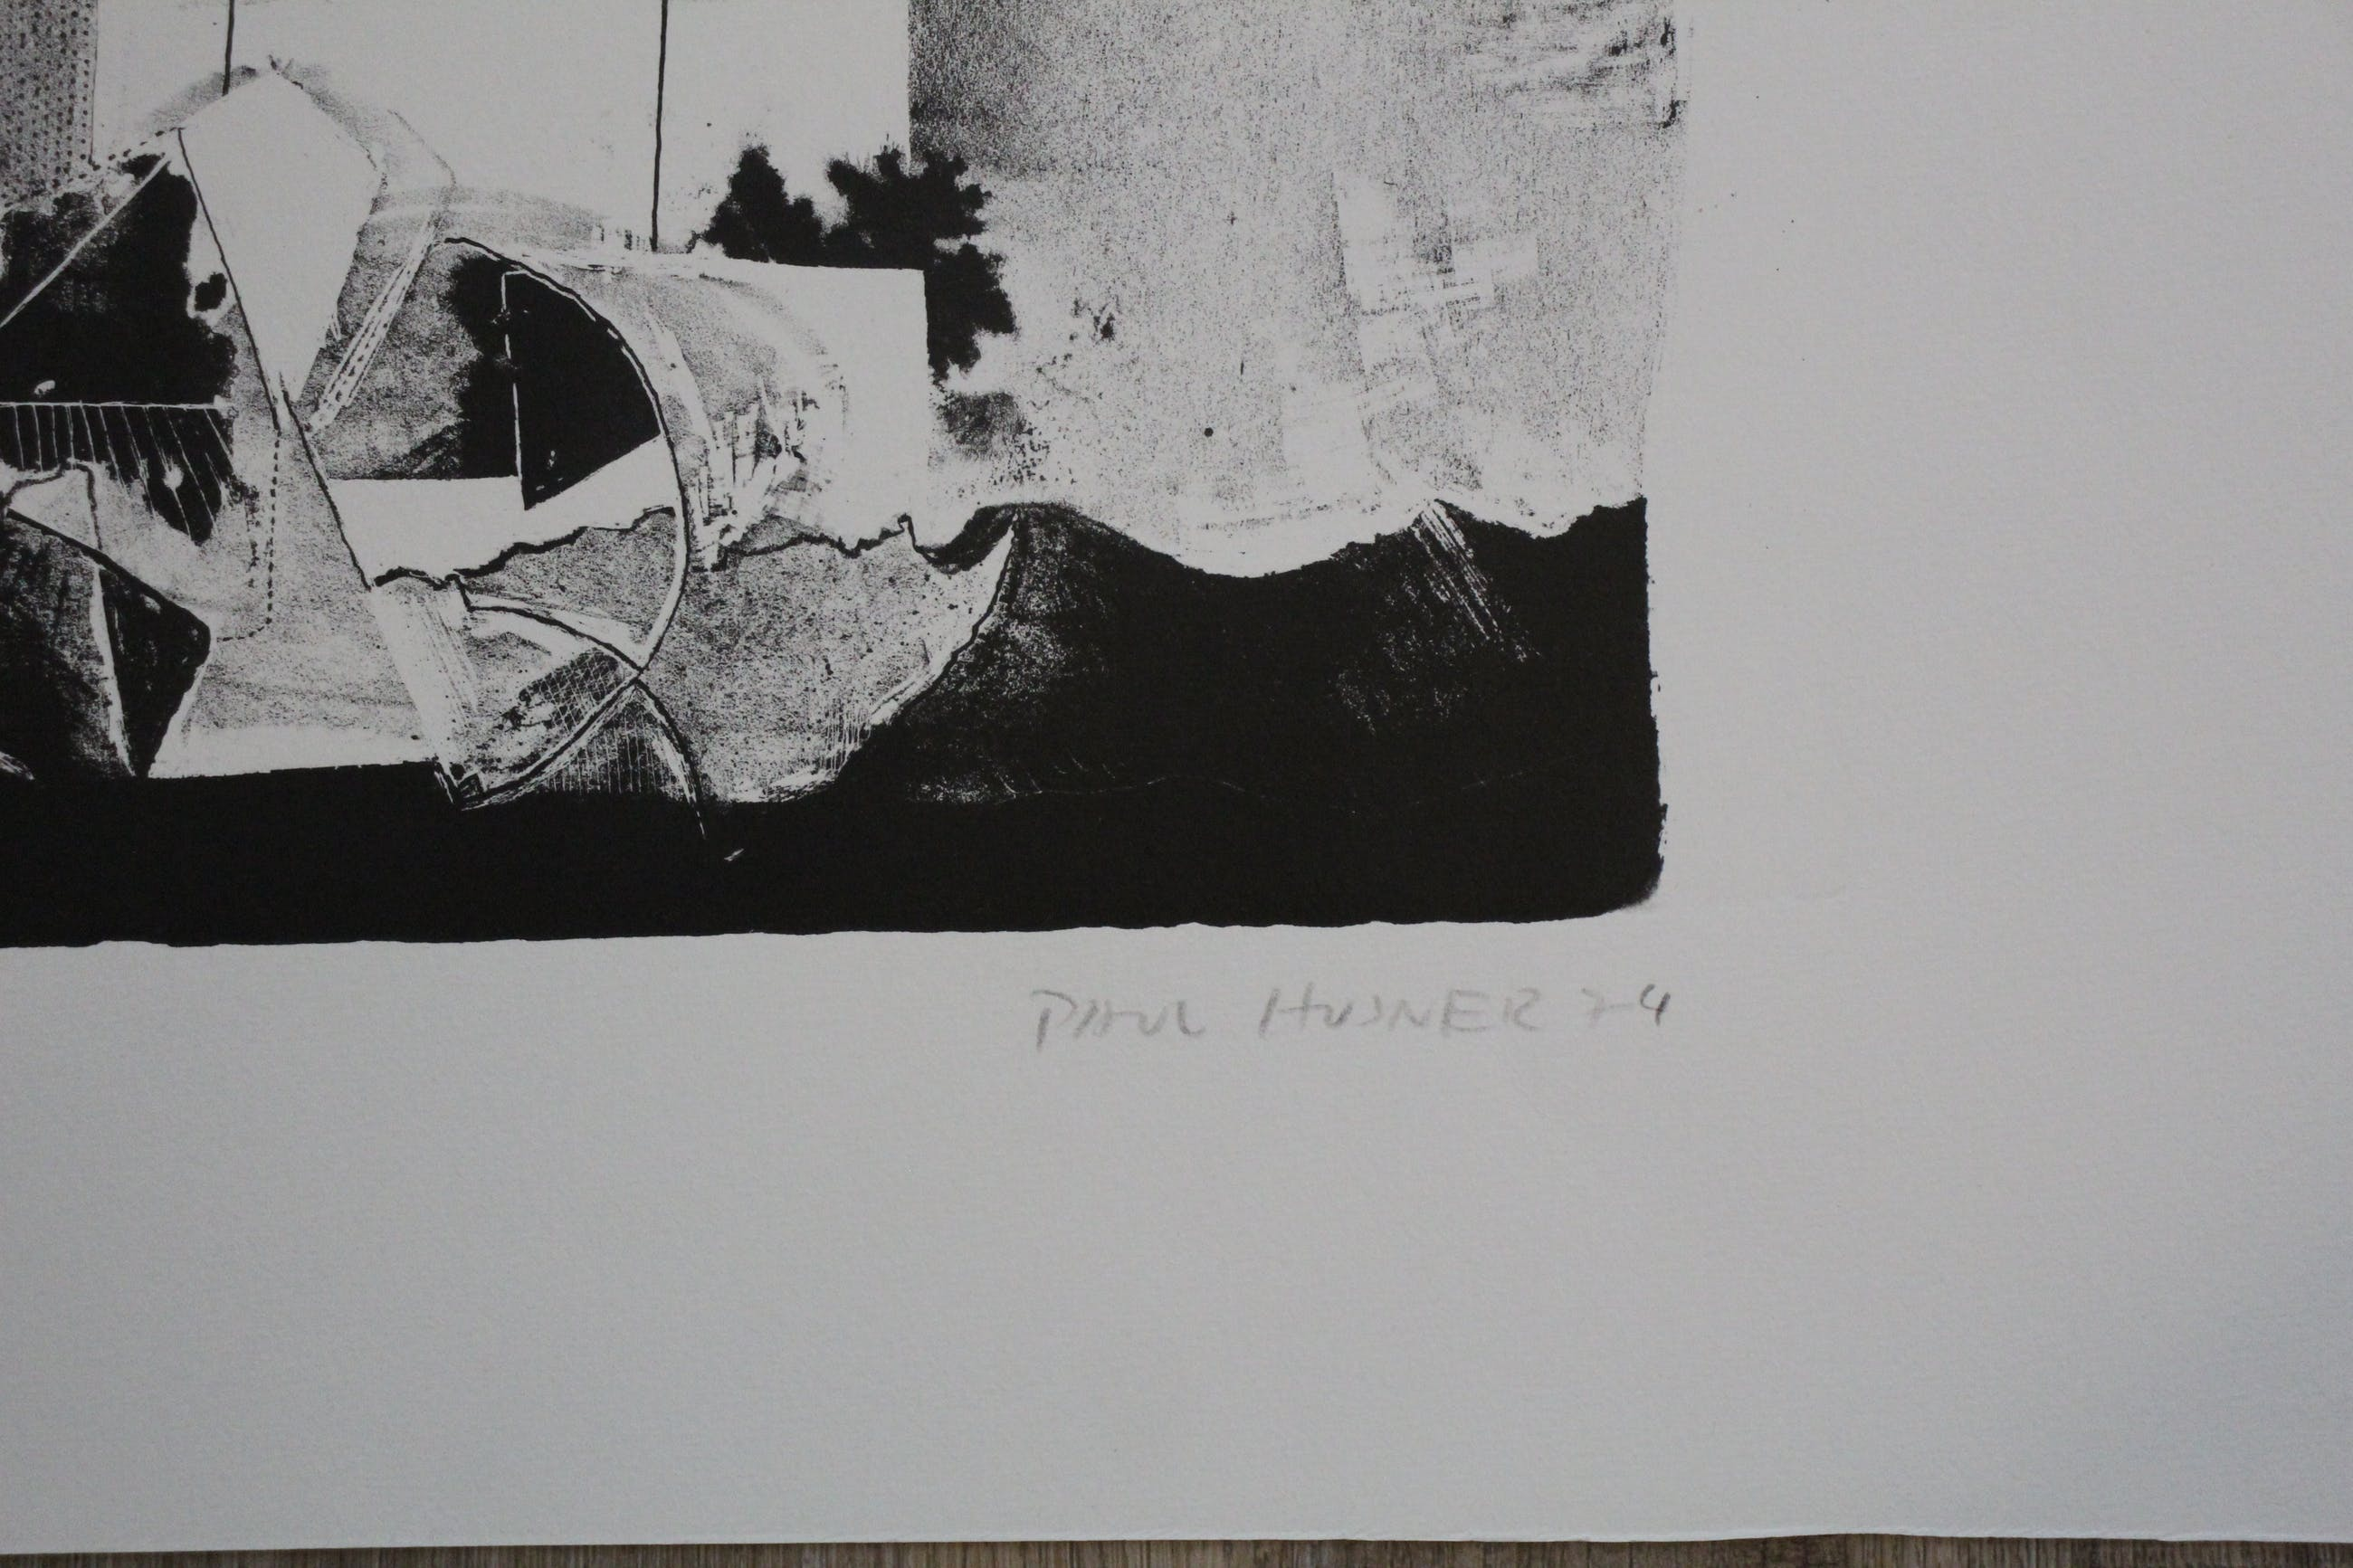 Paul Husner - Litho: 1974 kopen? Bied vanaf 45!